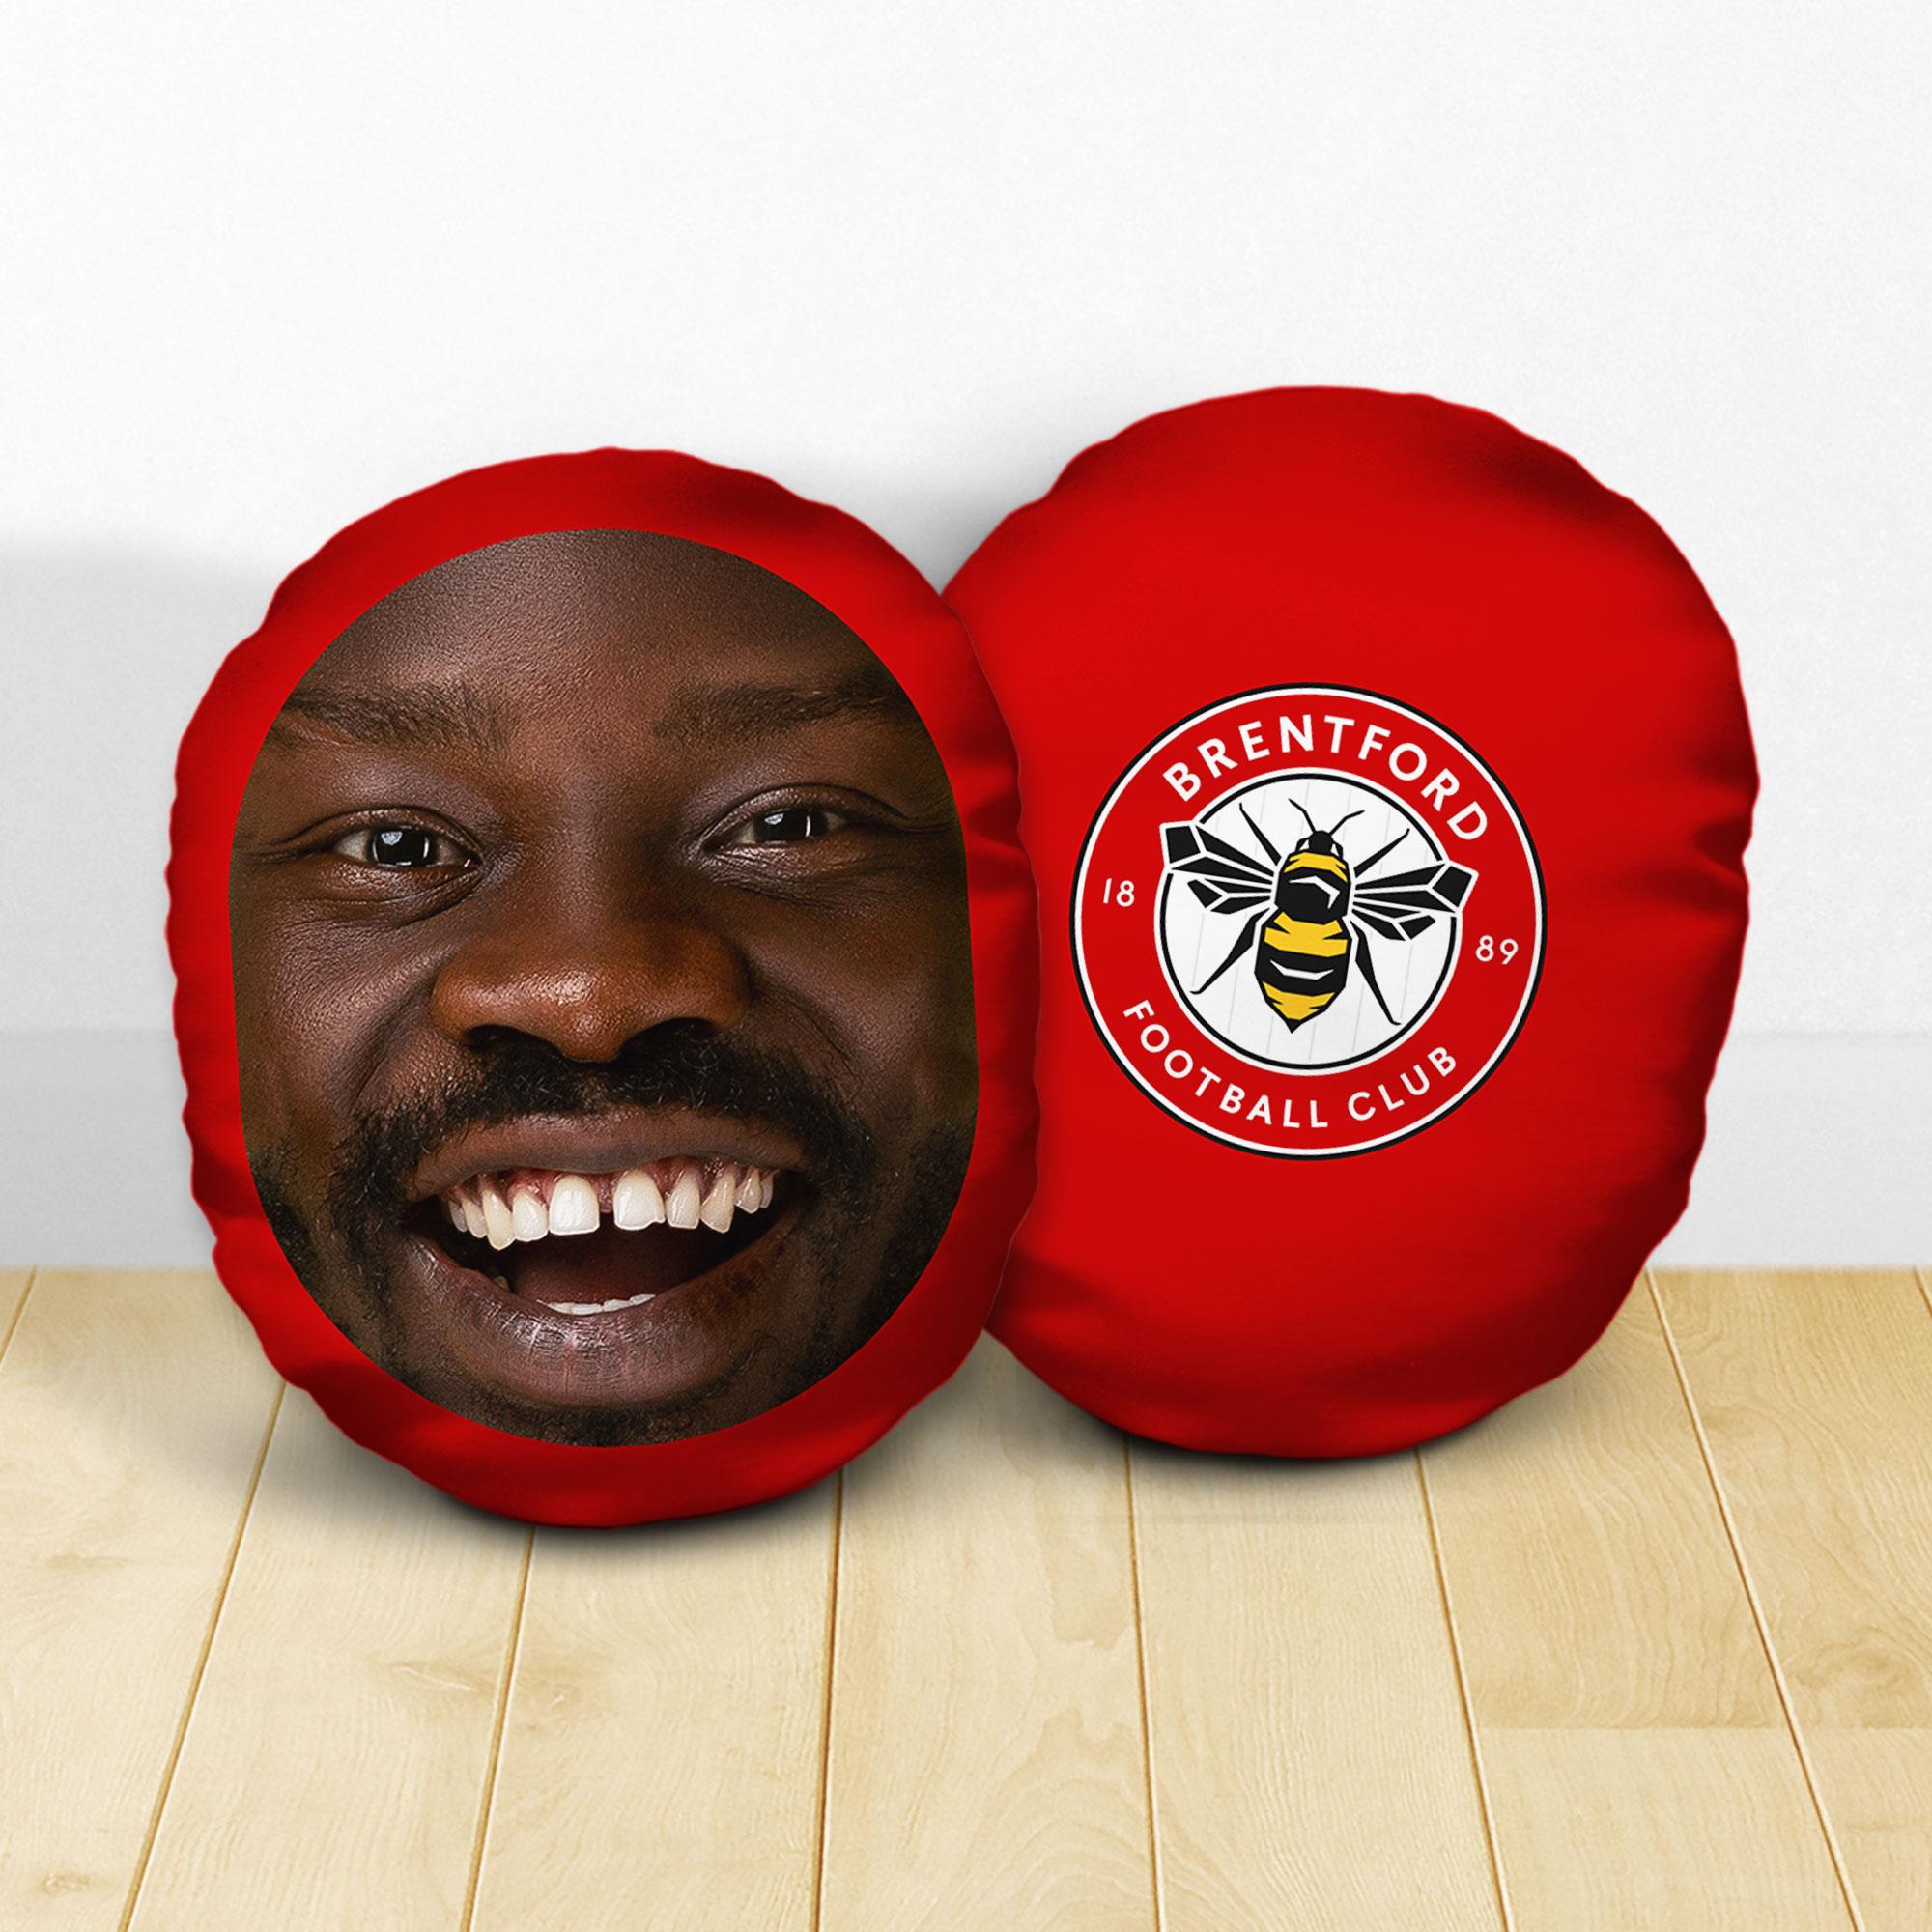 Personalised Brentford FC Crest Mush Cush